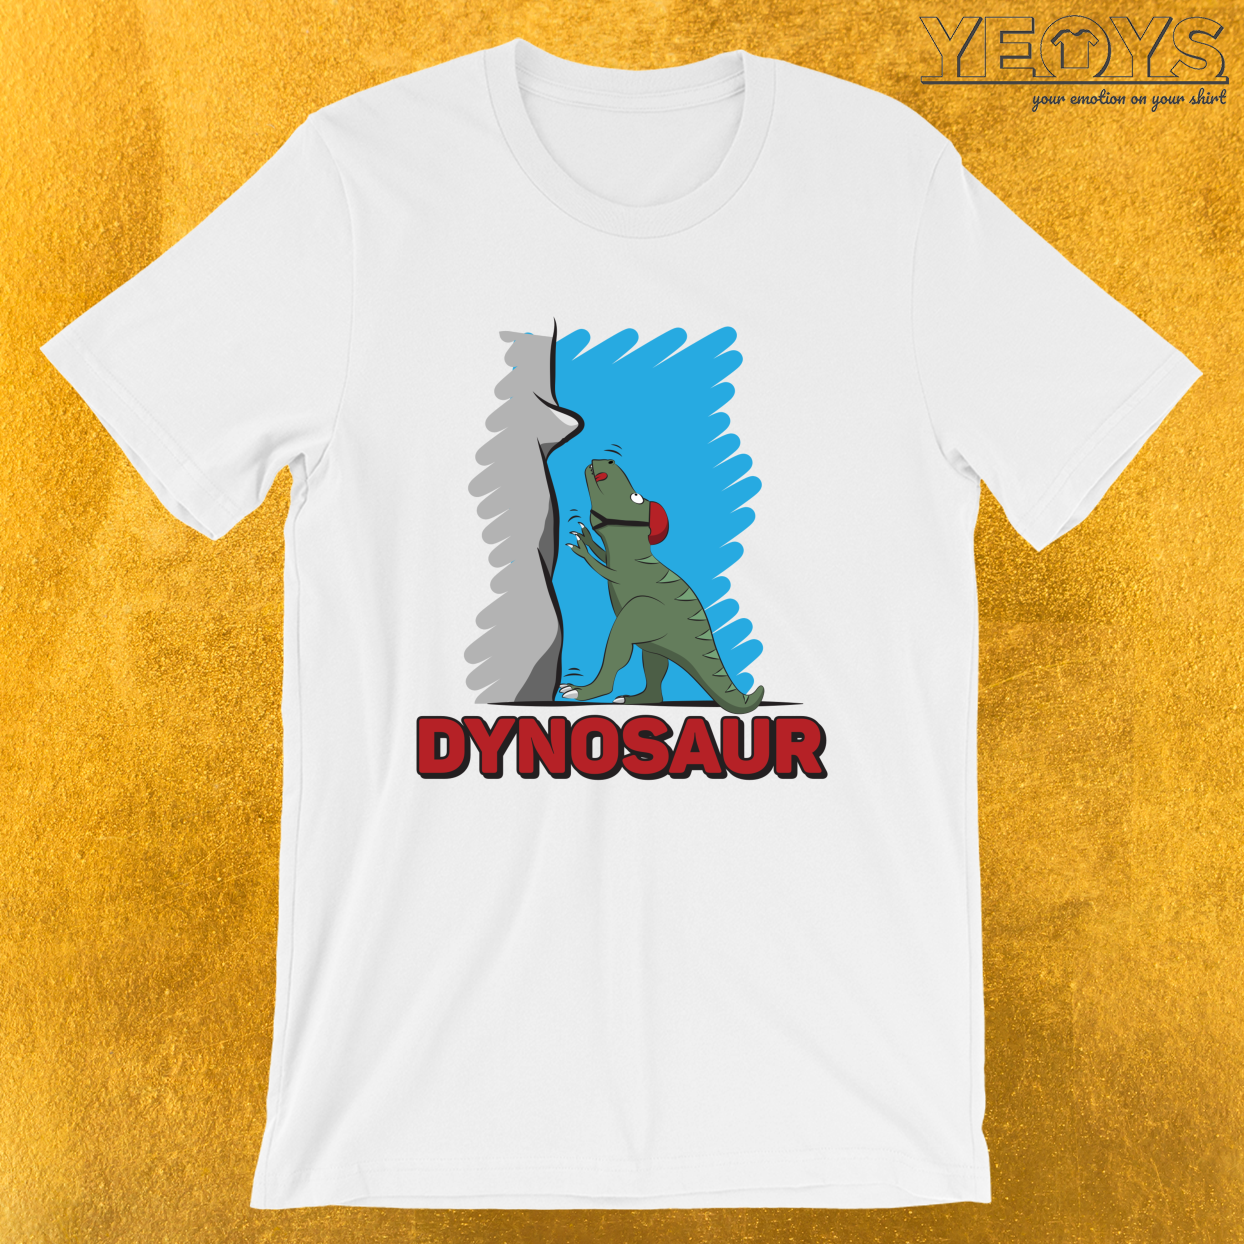 Dynosaur – Climbing & Boulder Tee